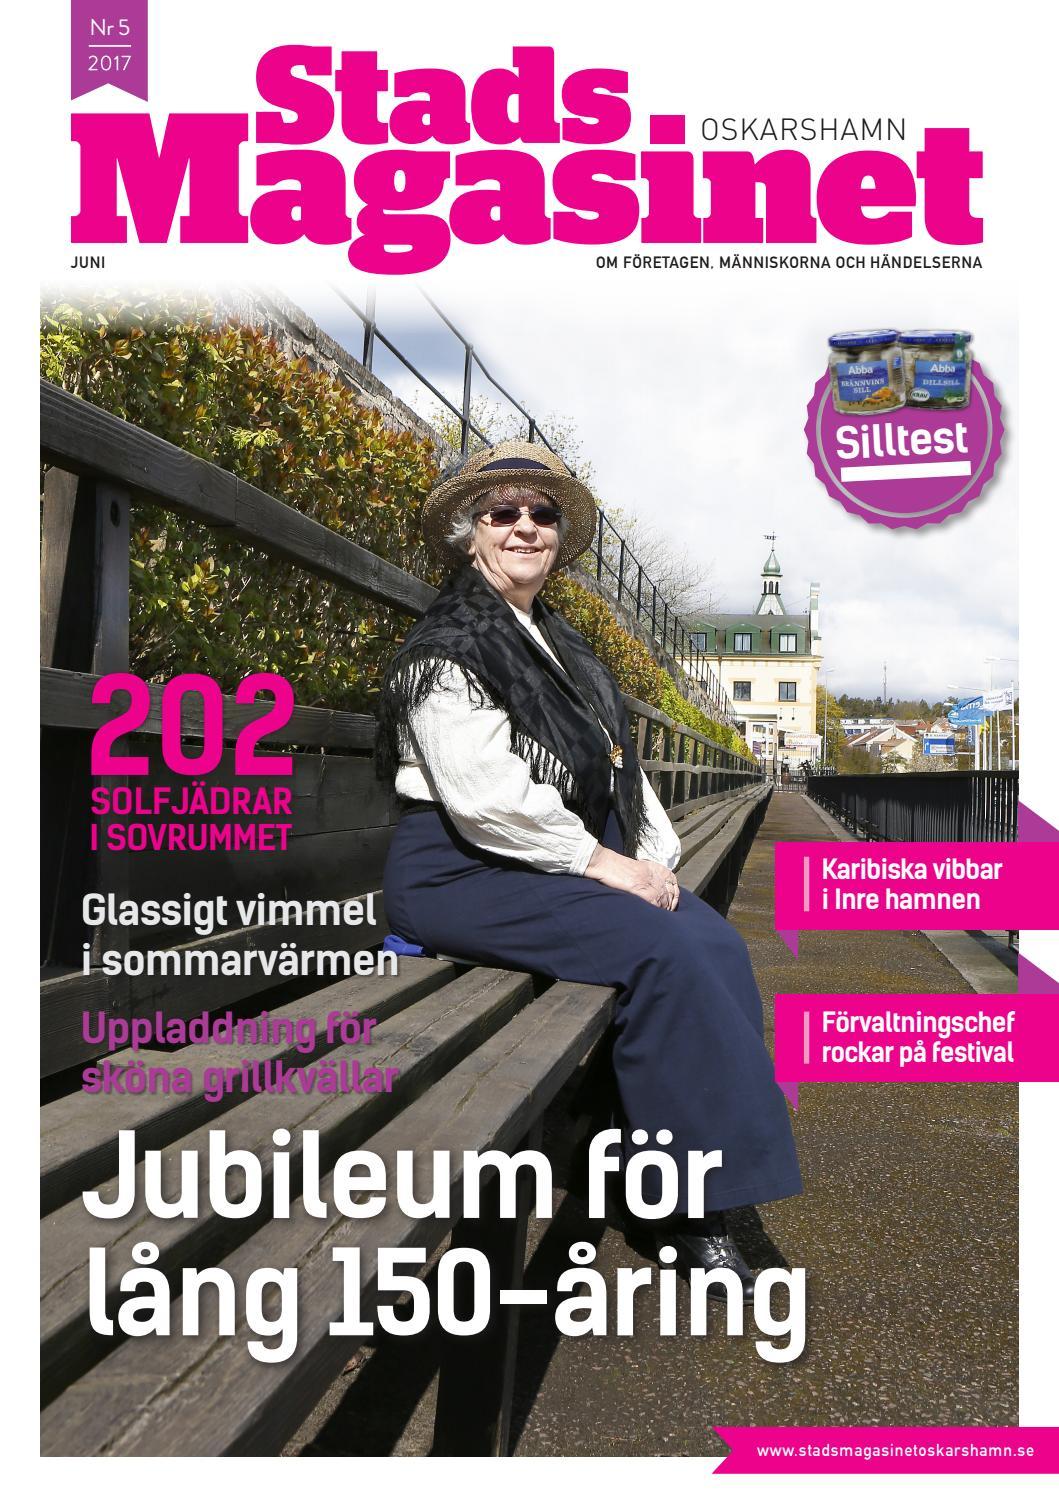 Kustvgen 9 Kalmar ln, Pskallavik - unam.net